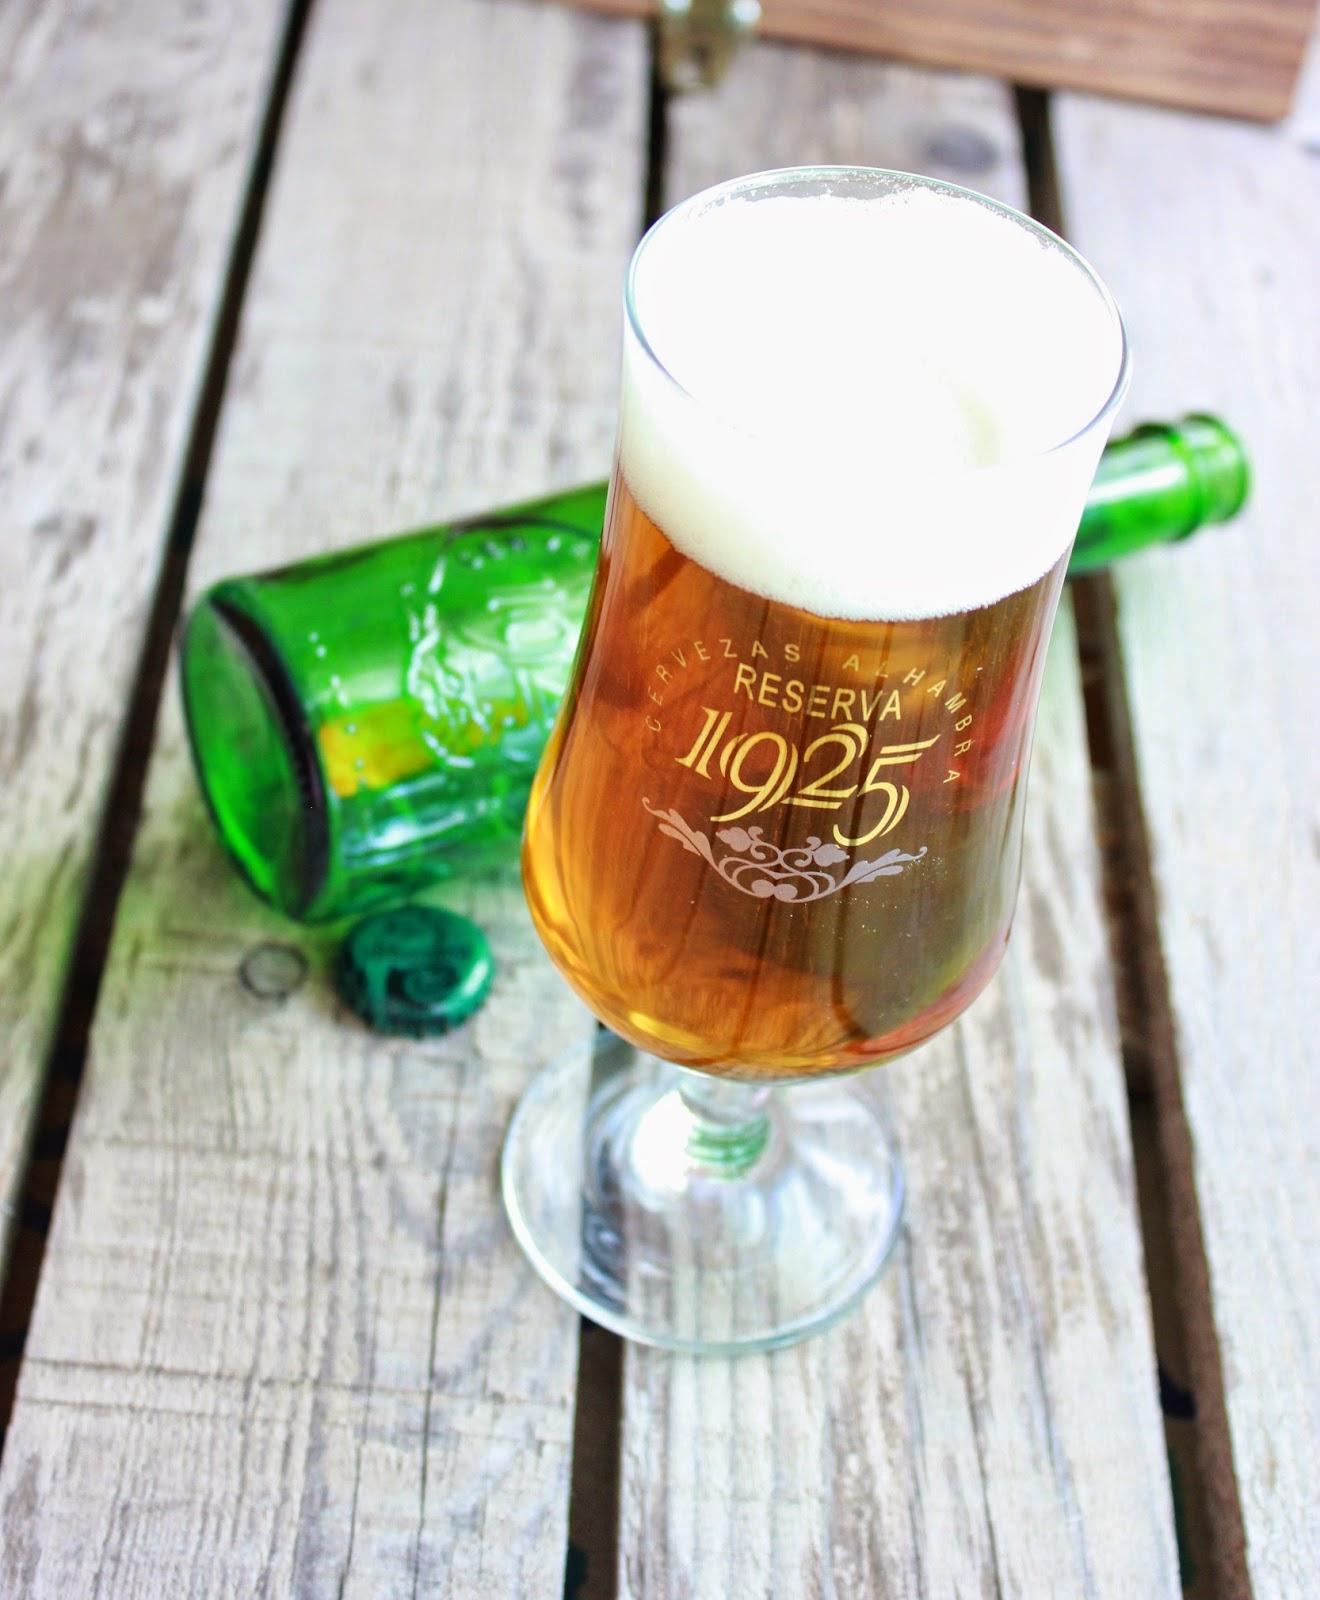 Cerveza Alhambra Reserva 1925 #ArteporDescubrir